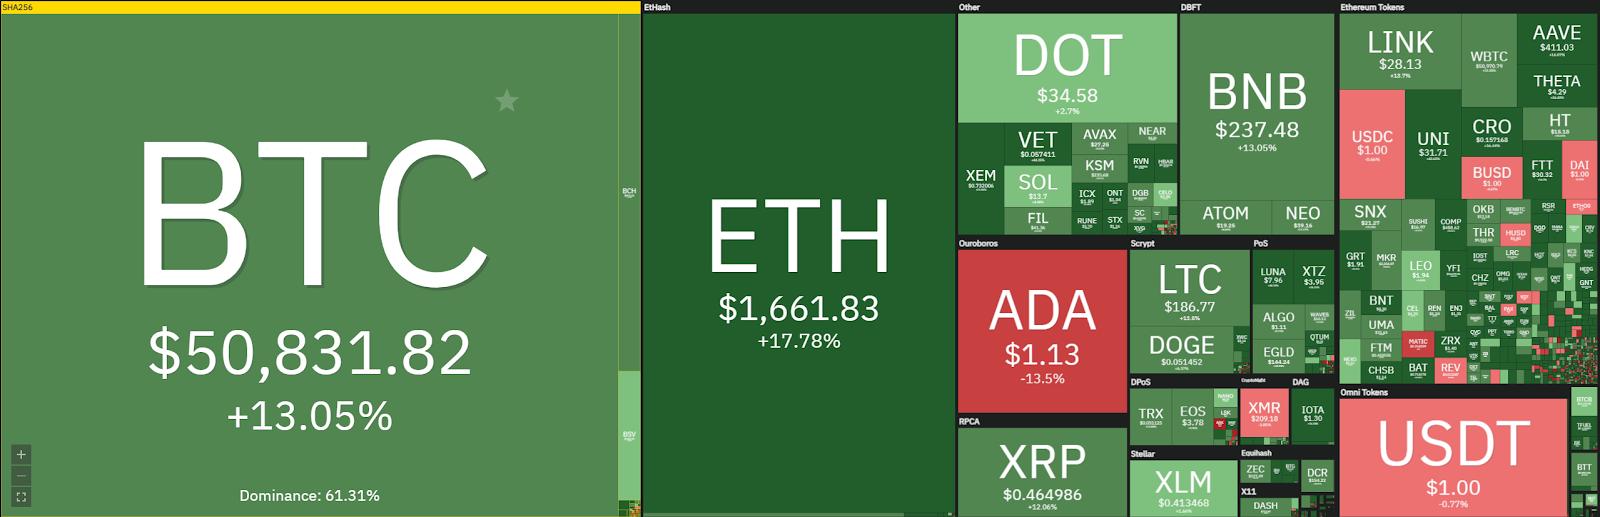 Weekly Crypto Price Analysis 7th Mar: BTC, ETH, XRP, DOT, SUSHI 1